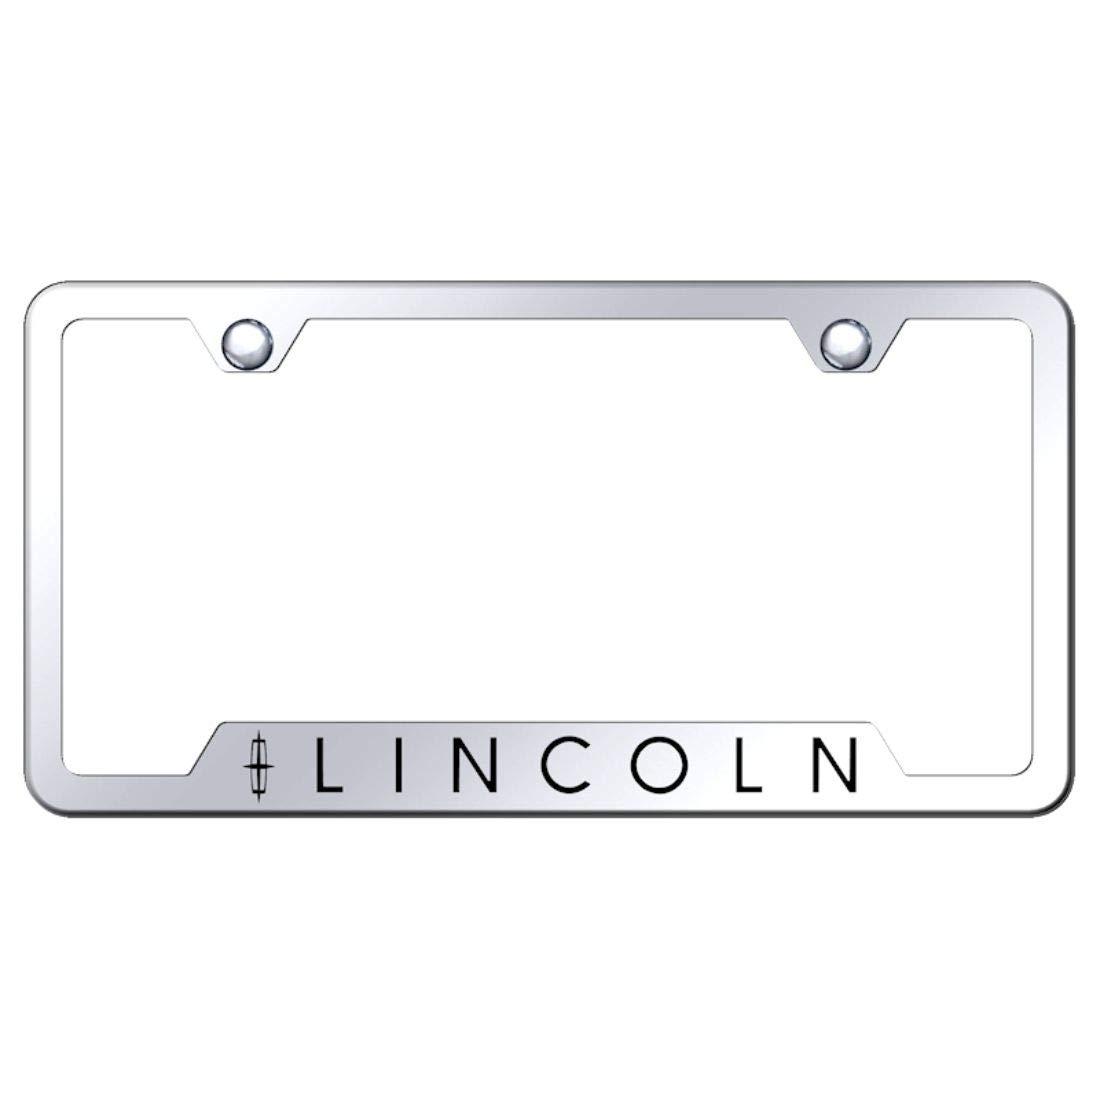 Lincoln Stainless Steel License Plate Frame MKX MKZ MKS MKT Engraved Chrome Made in USA Frame Mirror Bright Chrome